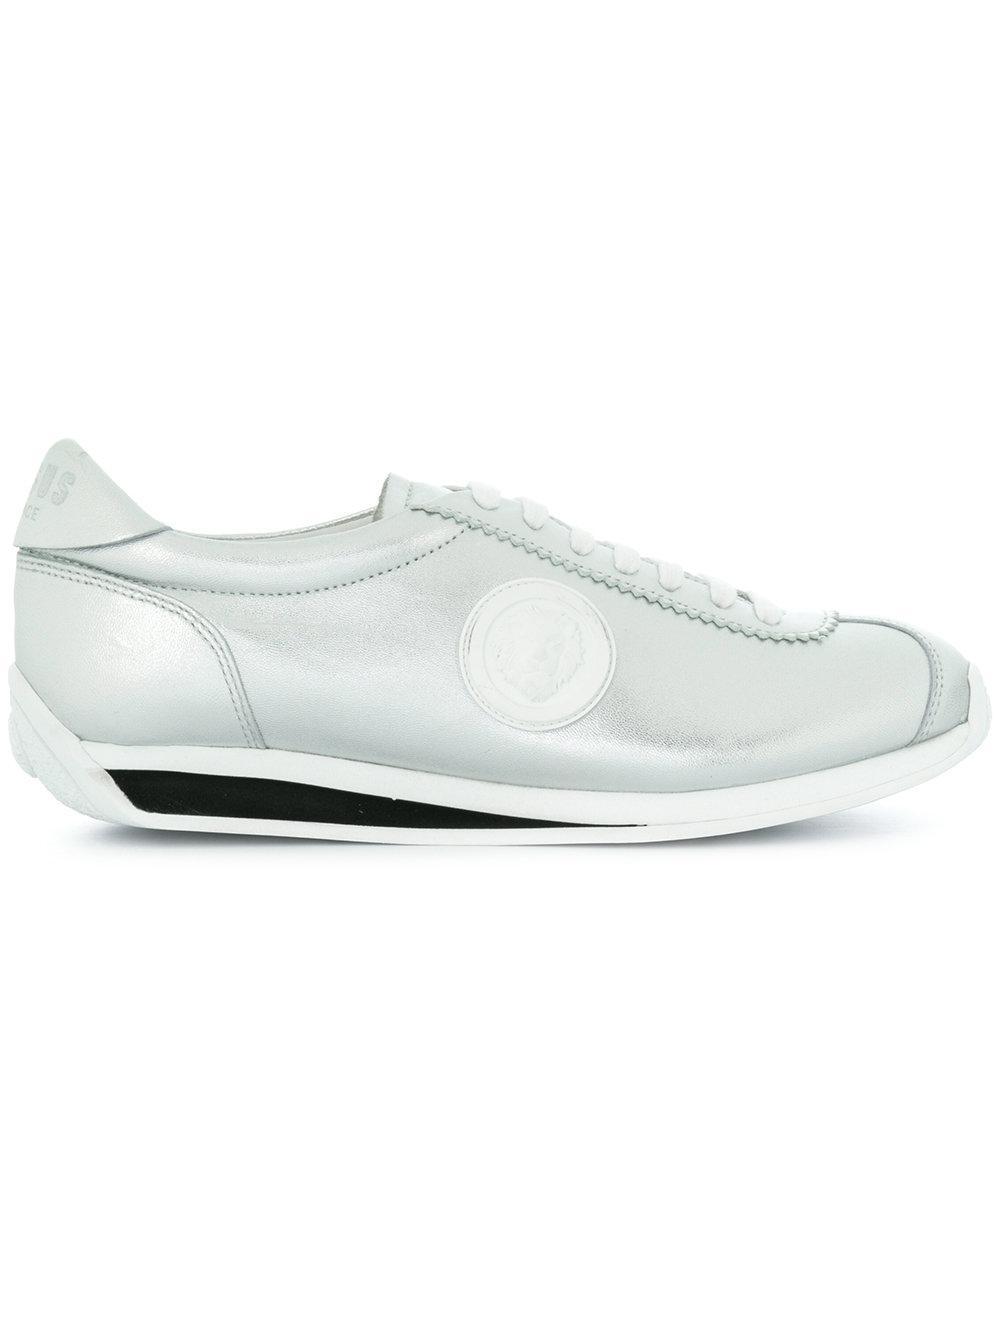 Versus Leather Laced Sneaker NIFaFK